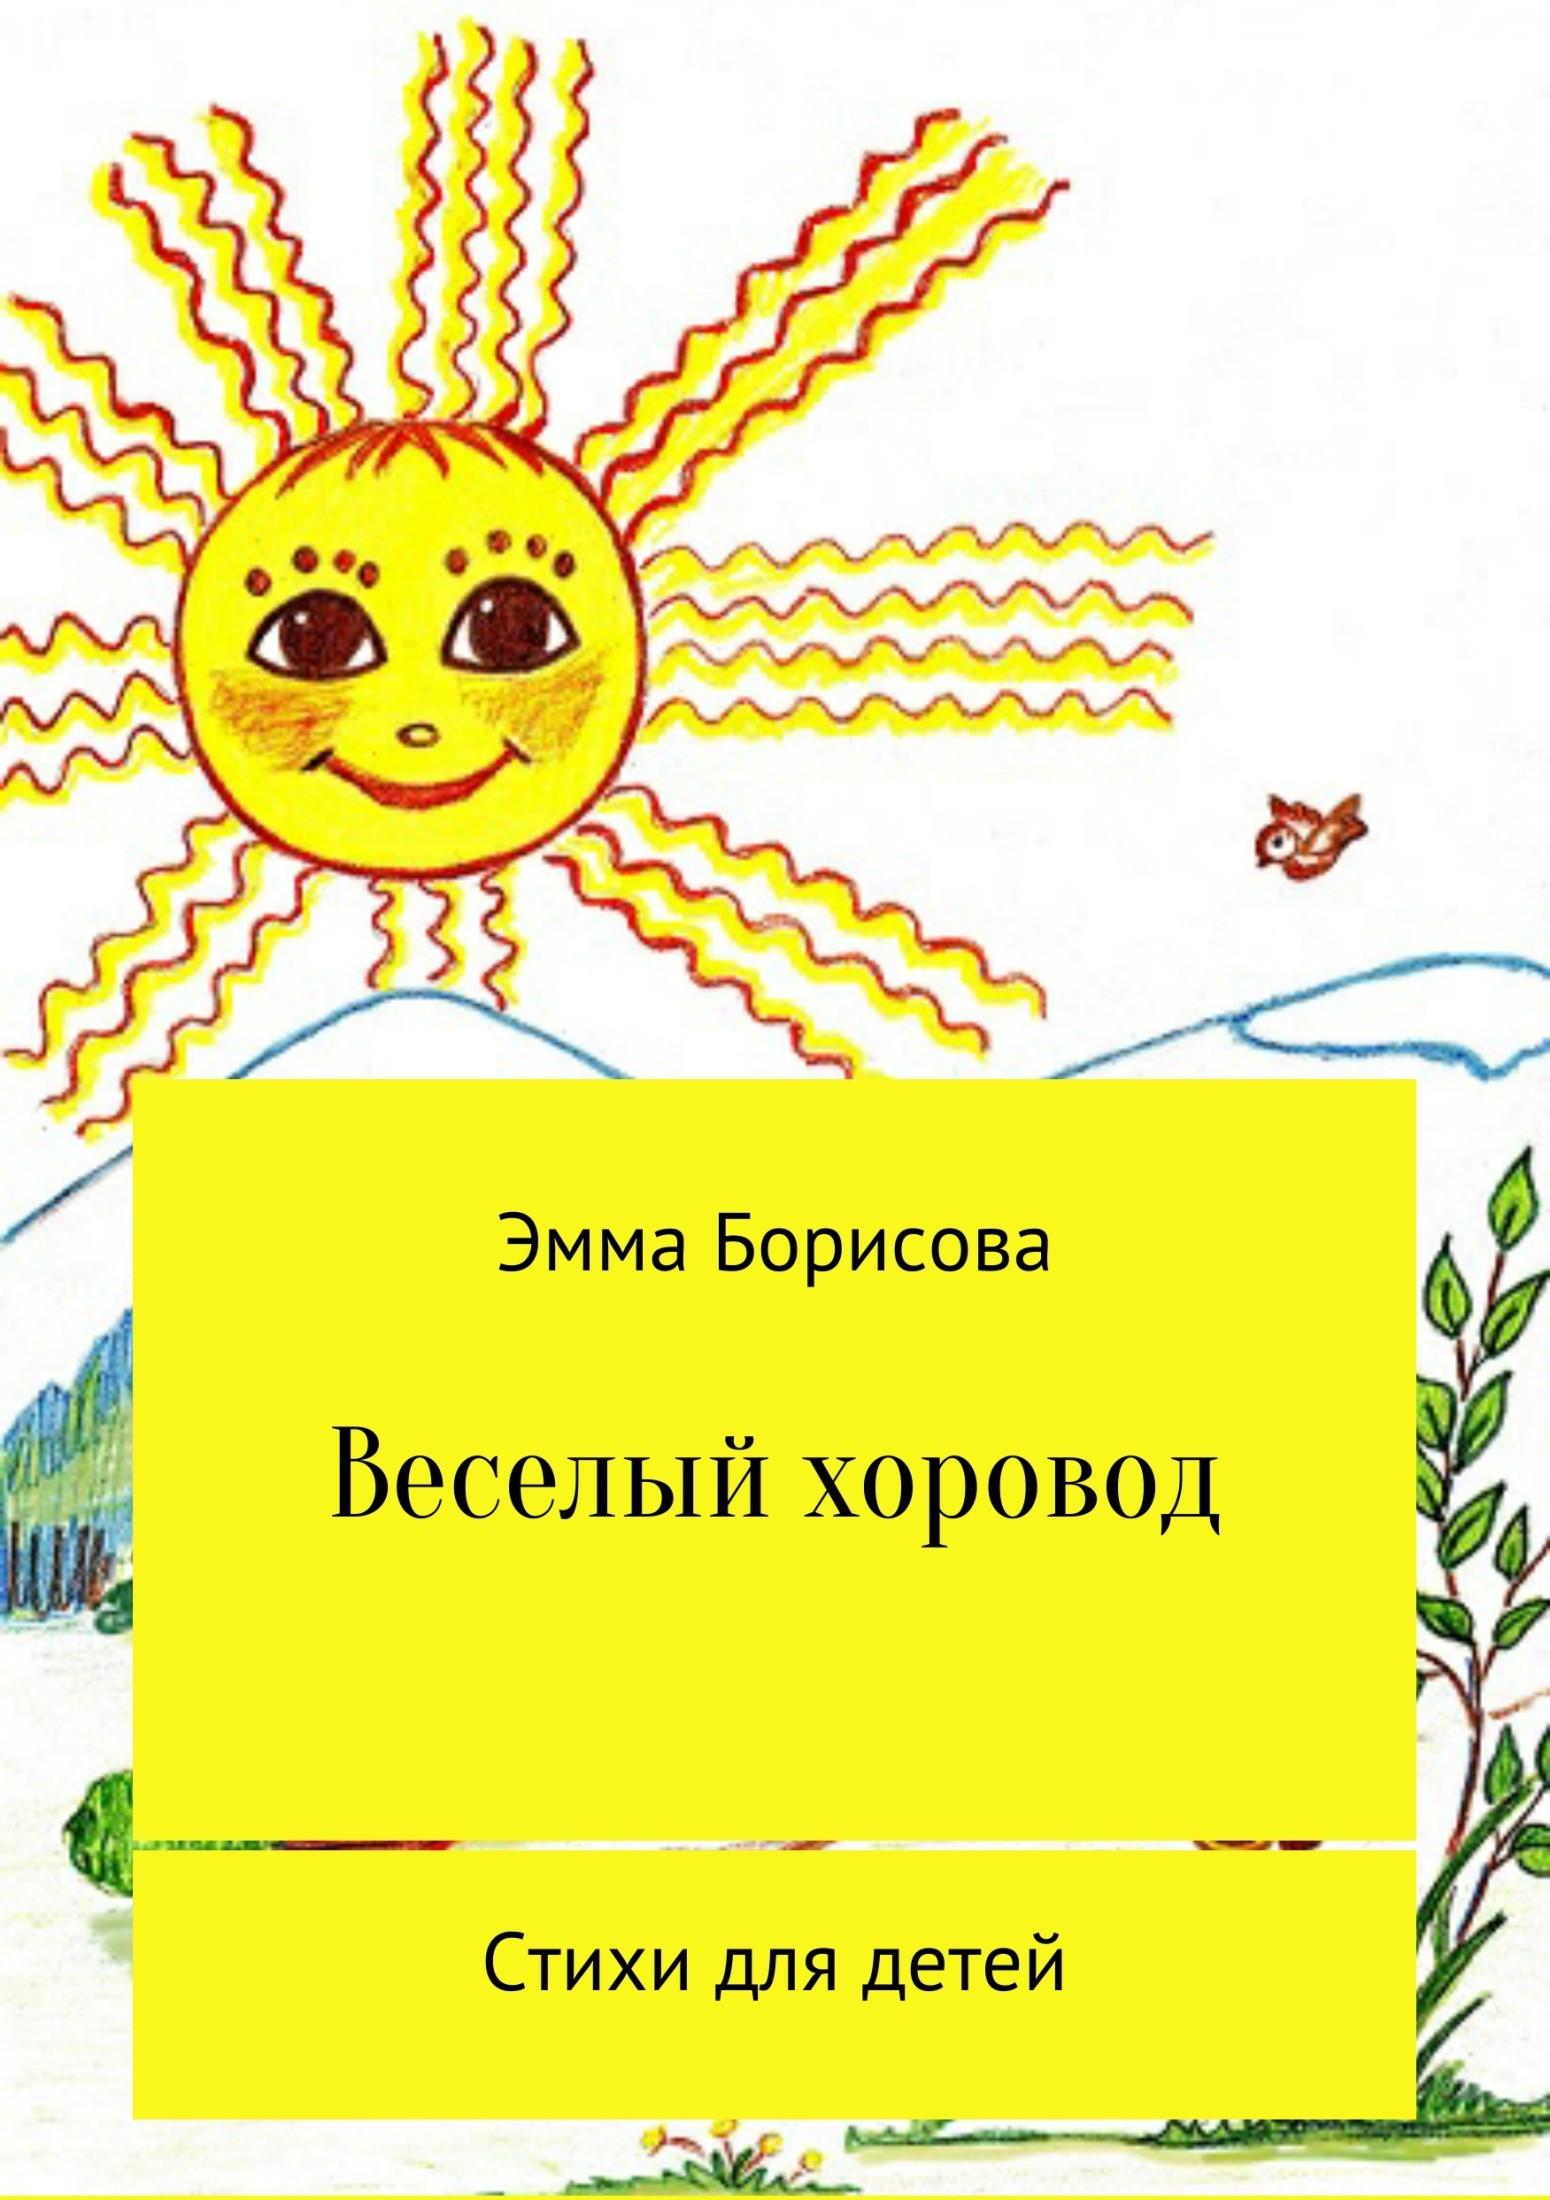 Эмма Борисова Веселый хоровод